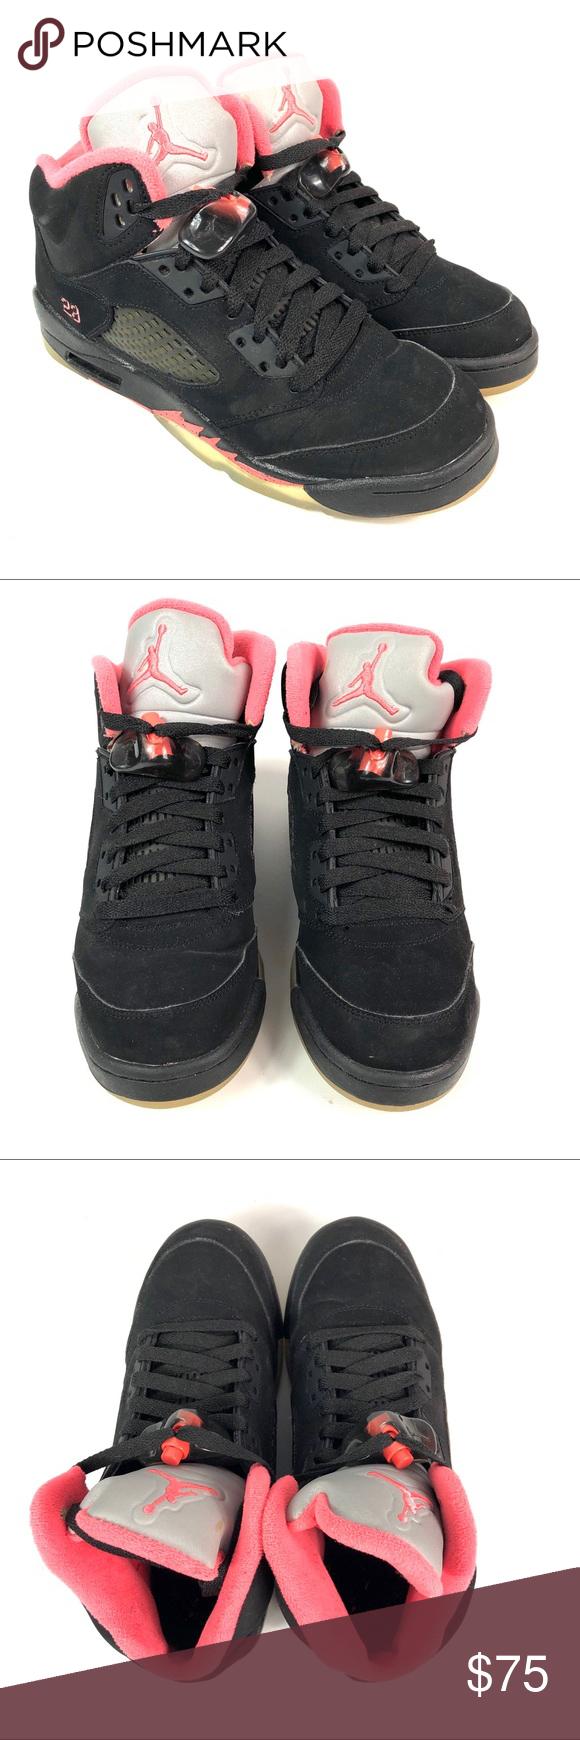 Air Jordan Retro V BG GS Black/Pink Shoes (With images